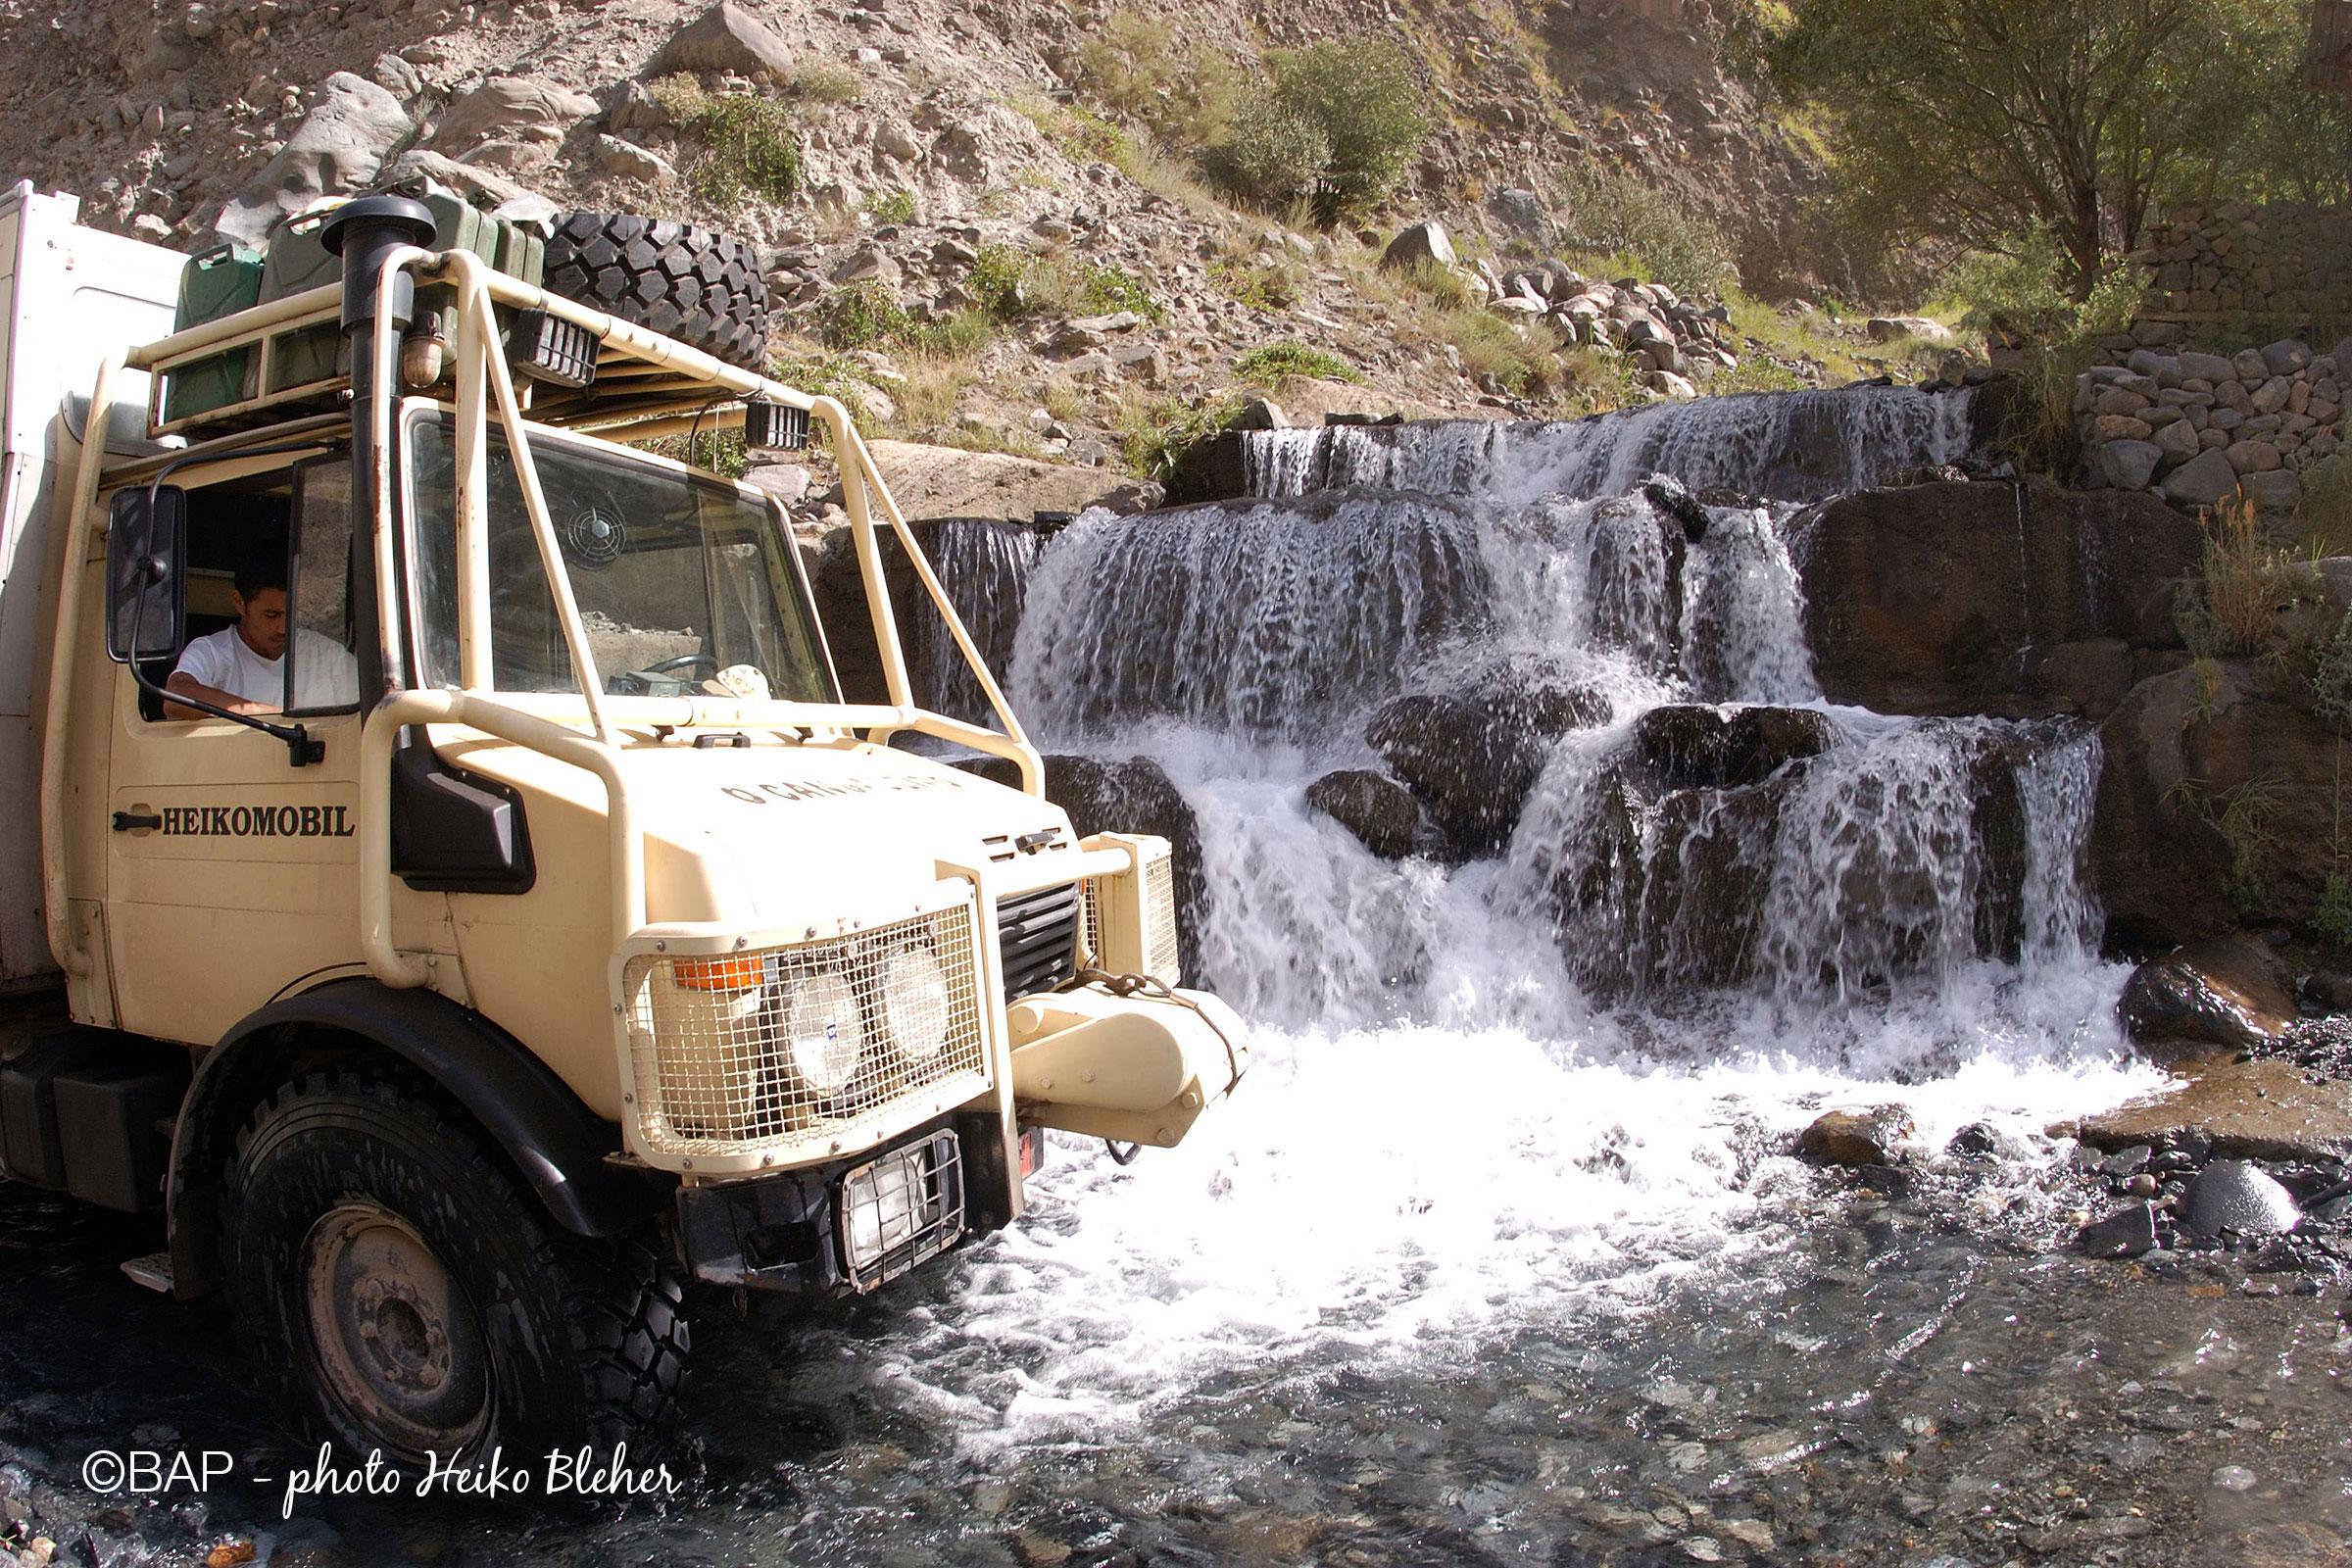 The Heikomobile along the Panjii River, Pamirs, Tajikistan. ©BAP, photo H. Bleher